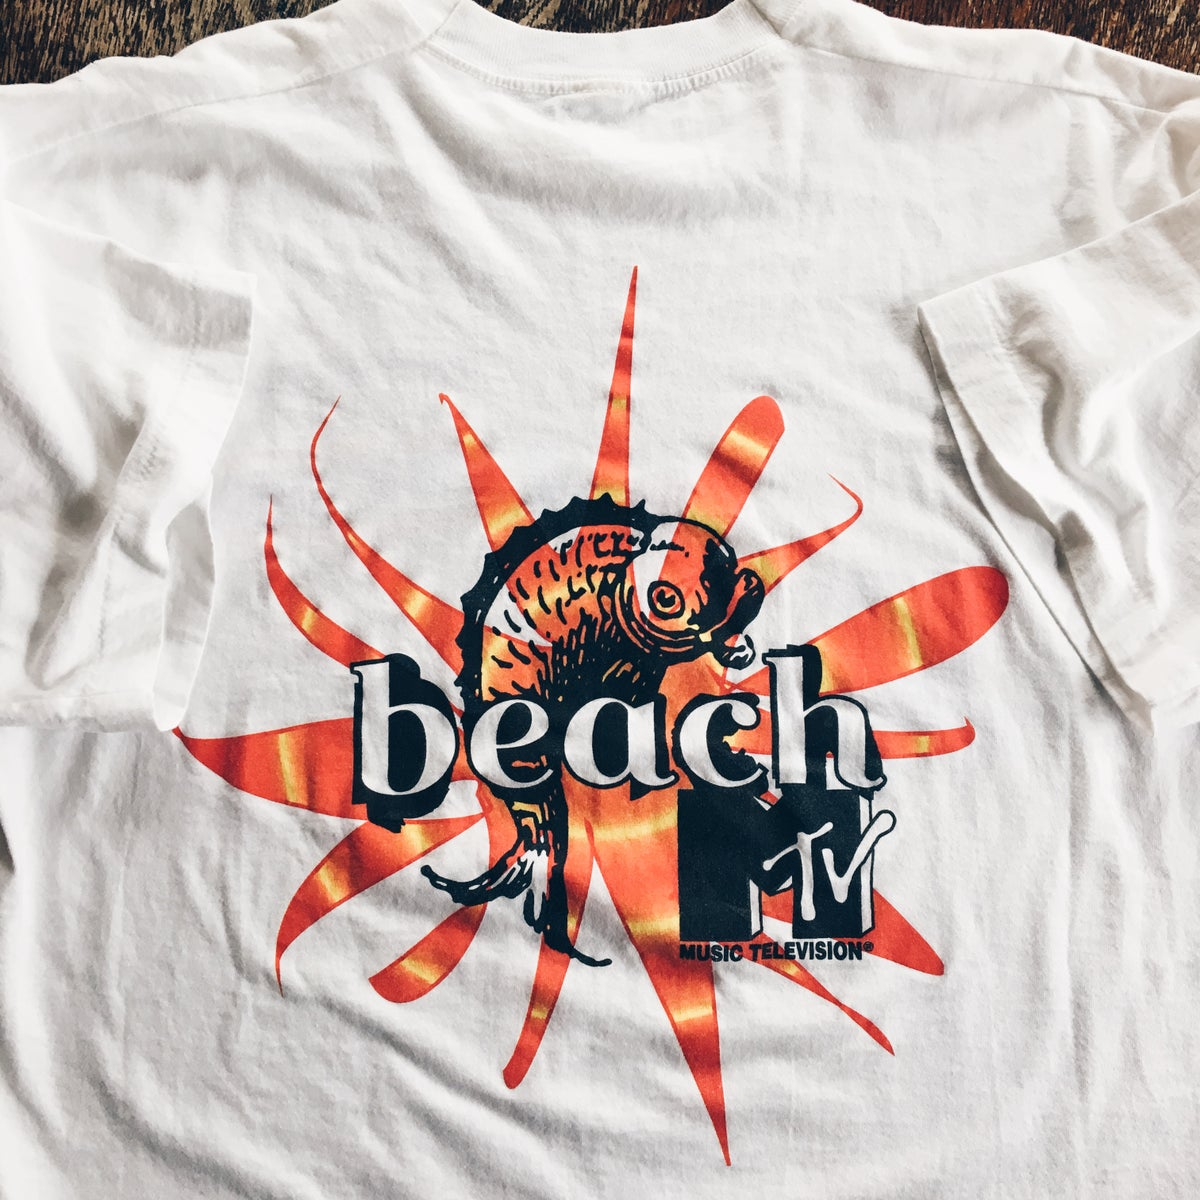 Image of Original 90's MTV Beach Tee.